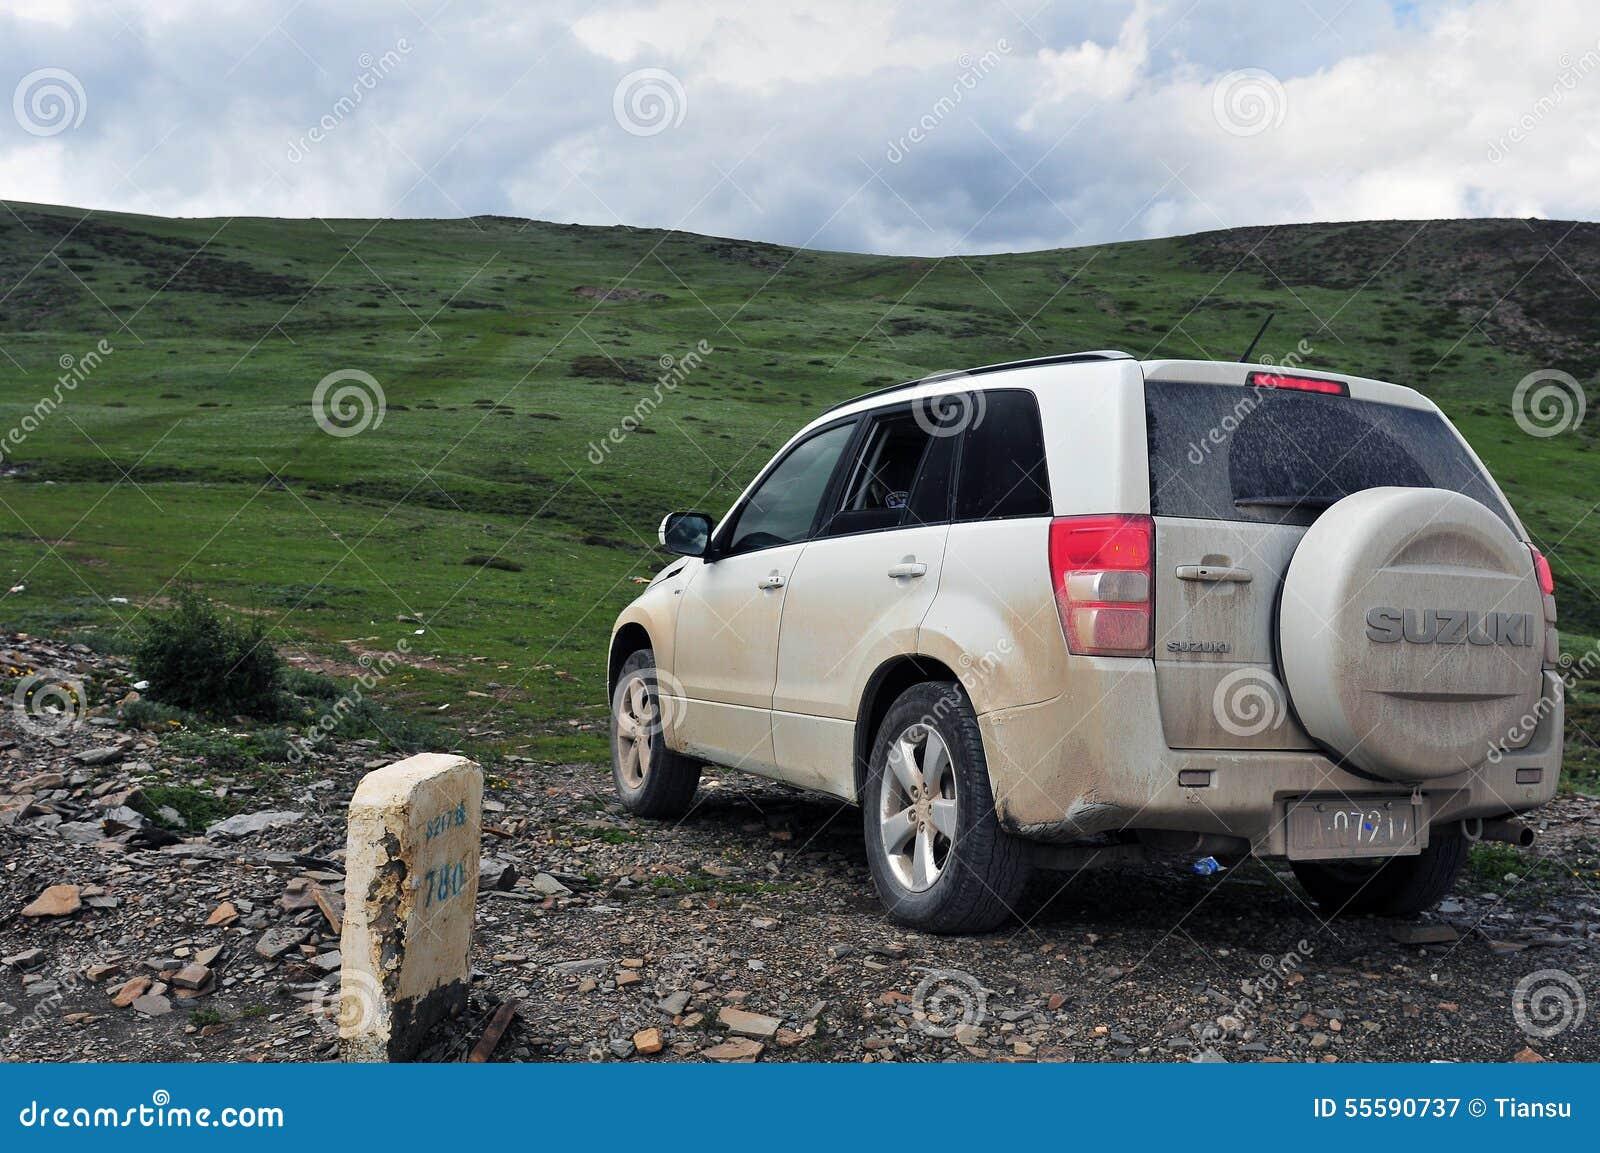 Suzuki Grand Vitara Mountain Journey Editorial Photography Image Of Malcesine Adventure 55590737